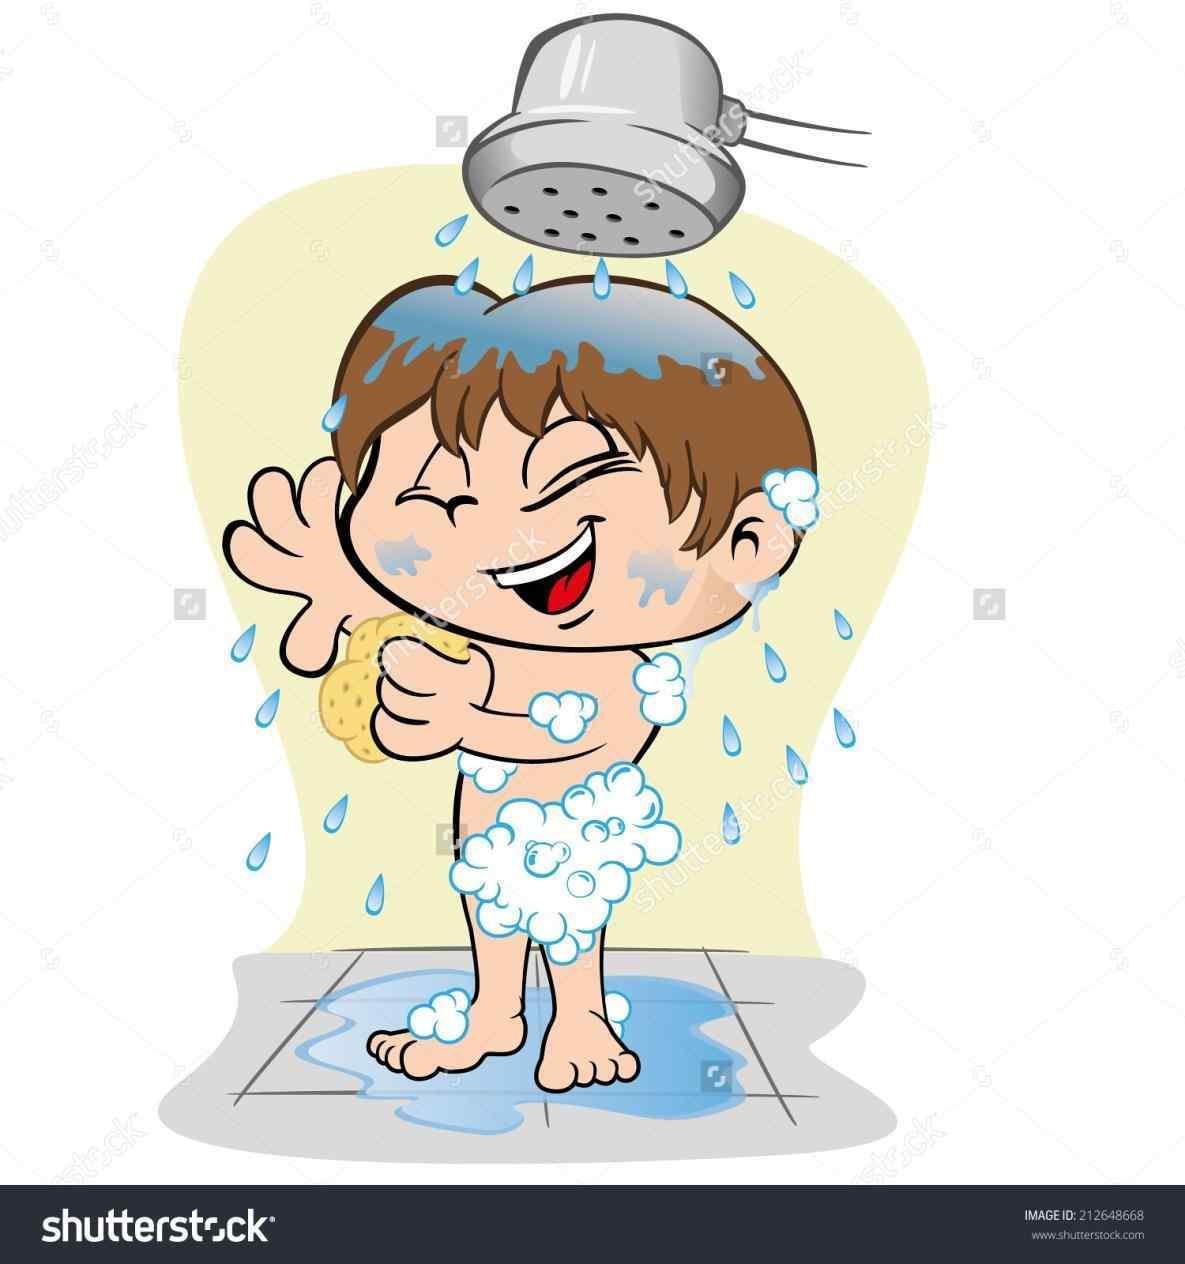 Showe clipart picture free Kids shower clipart 2 » Clipart Portal picture free